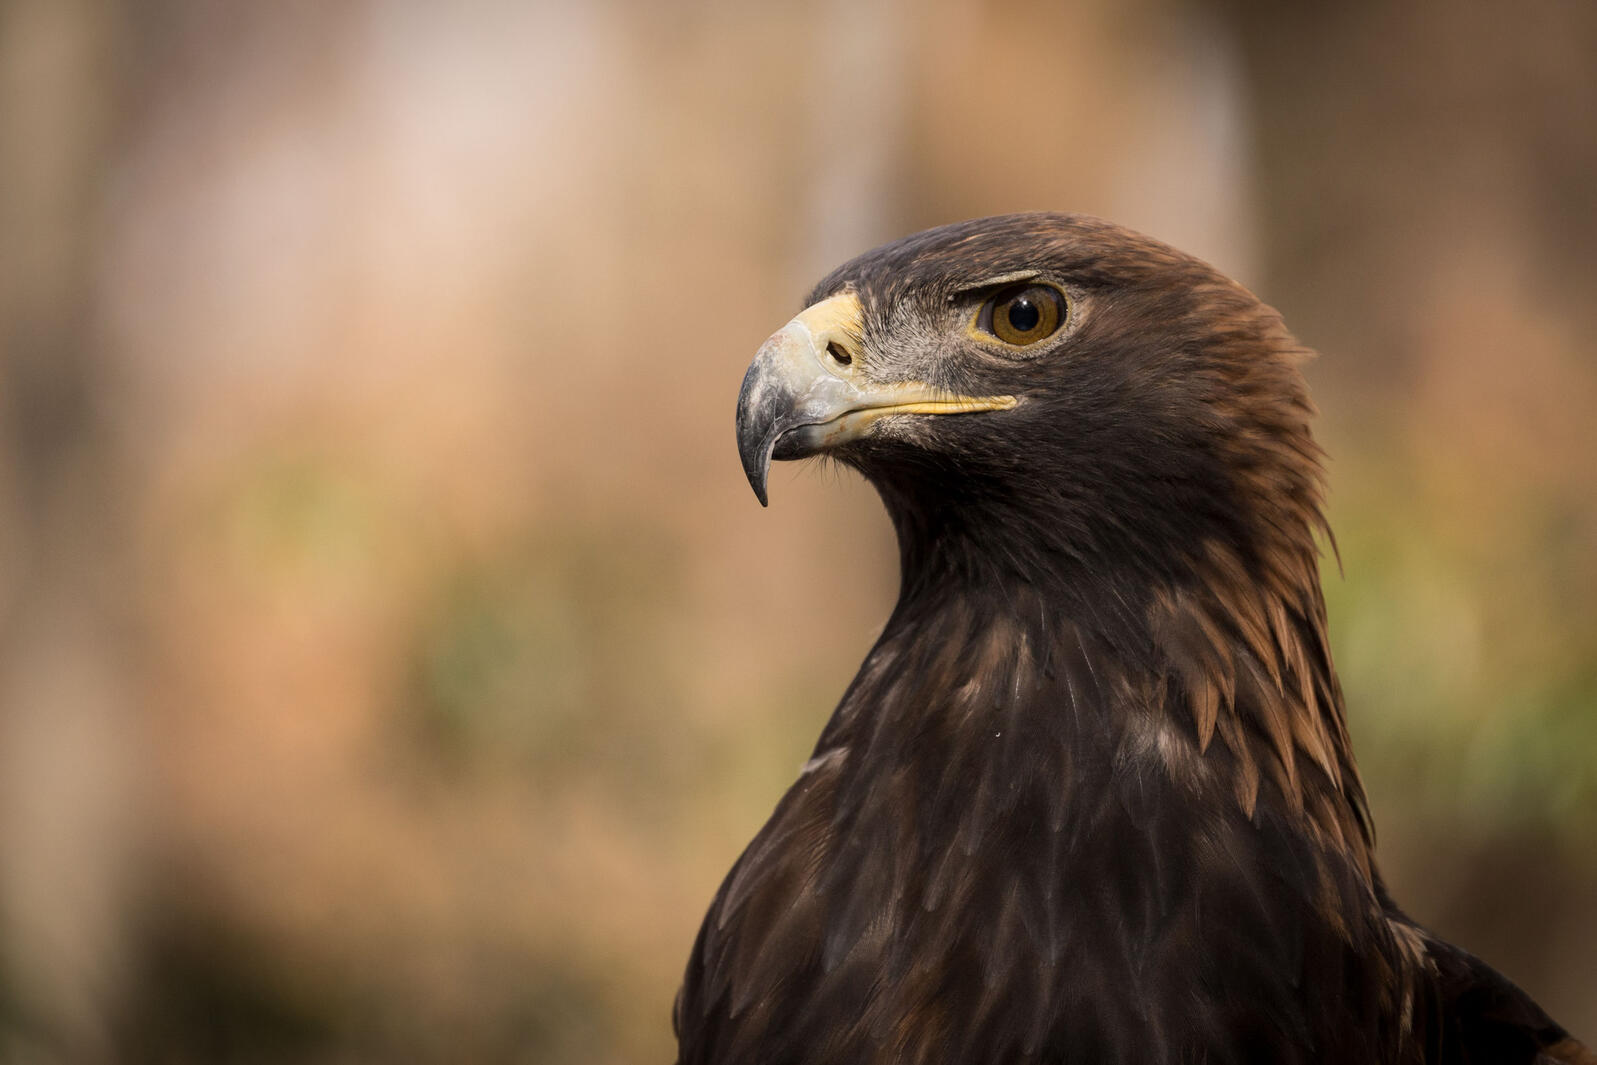 Golden Eagle. Kristen Franklin/Audubon Photography Awards